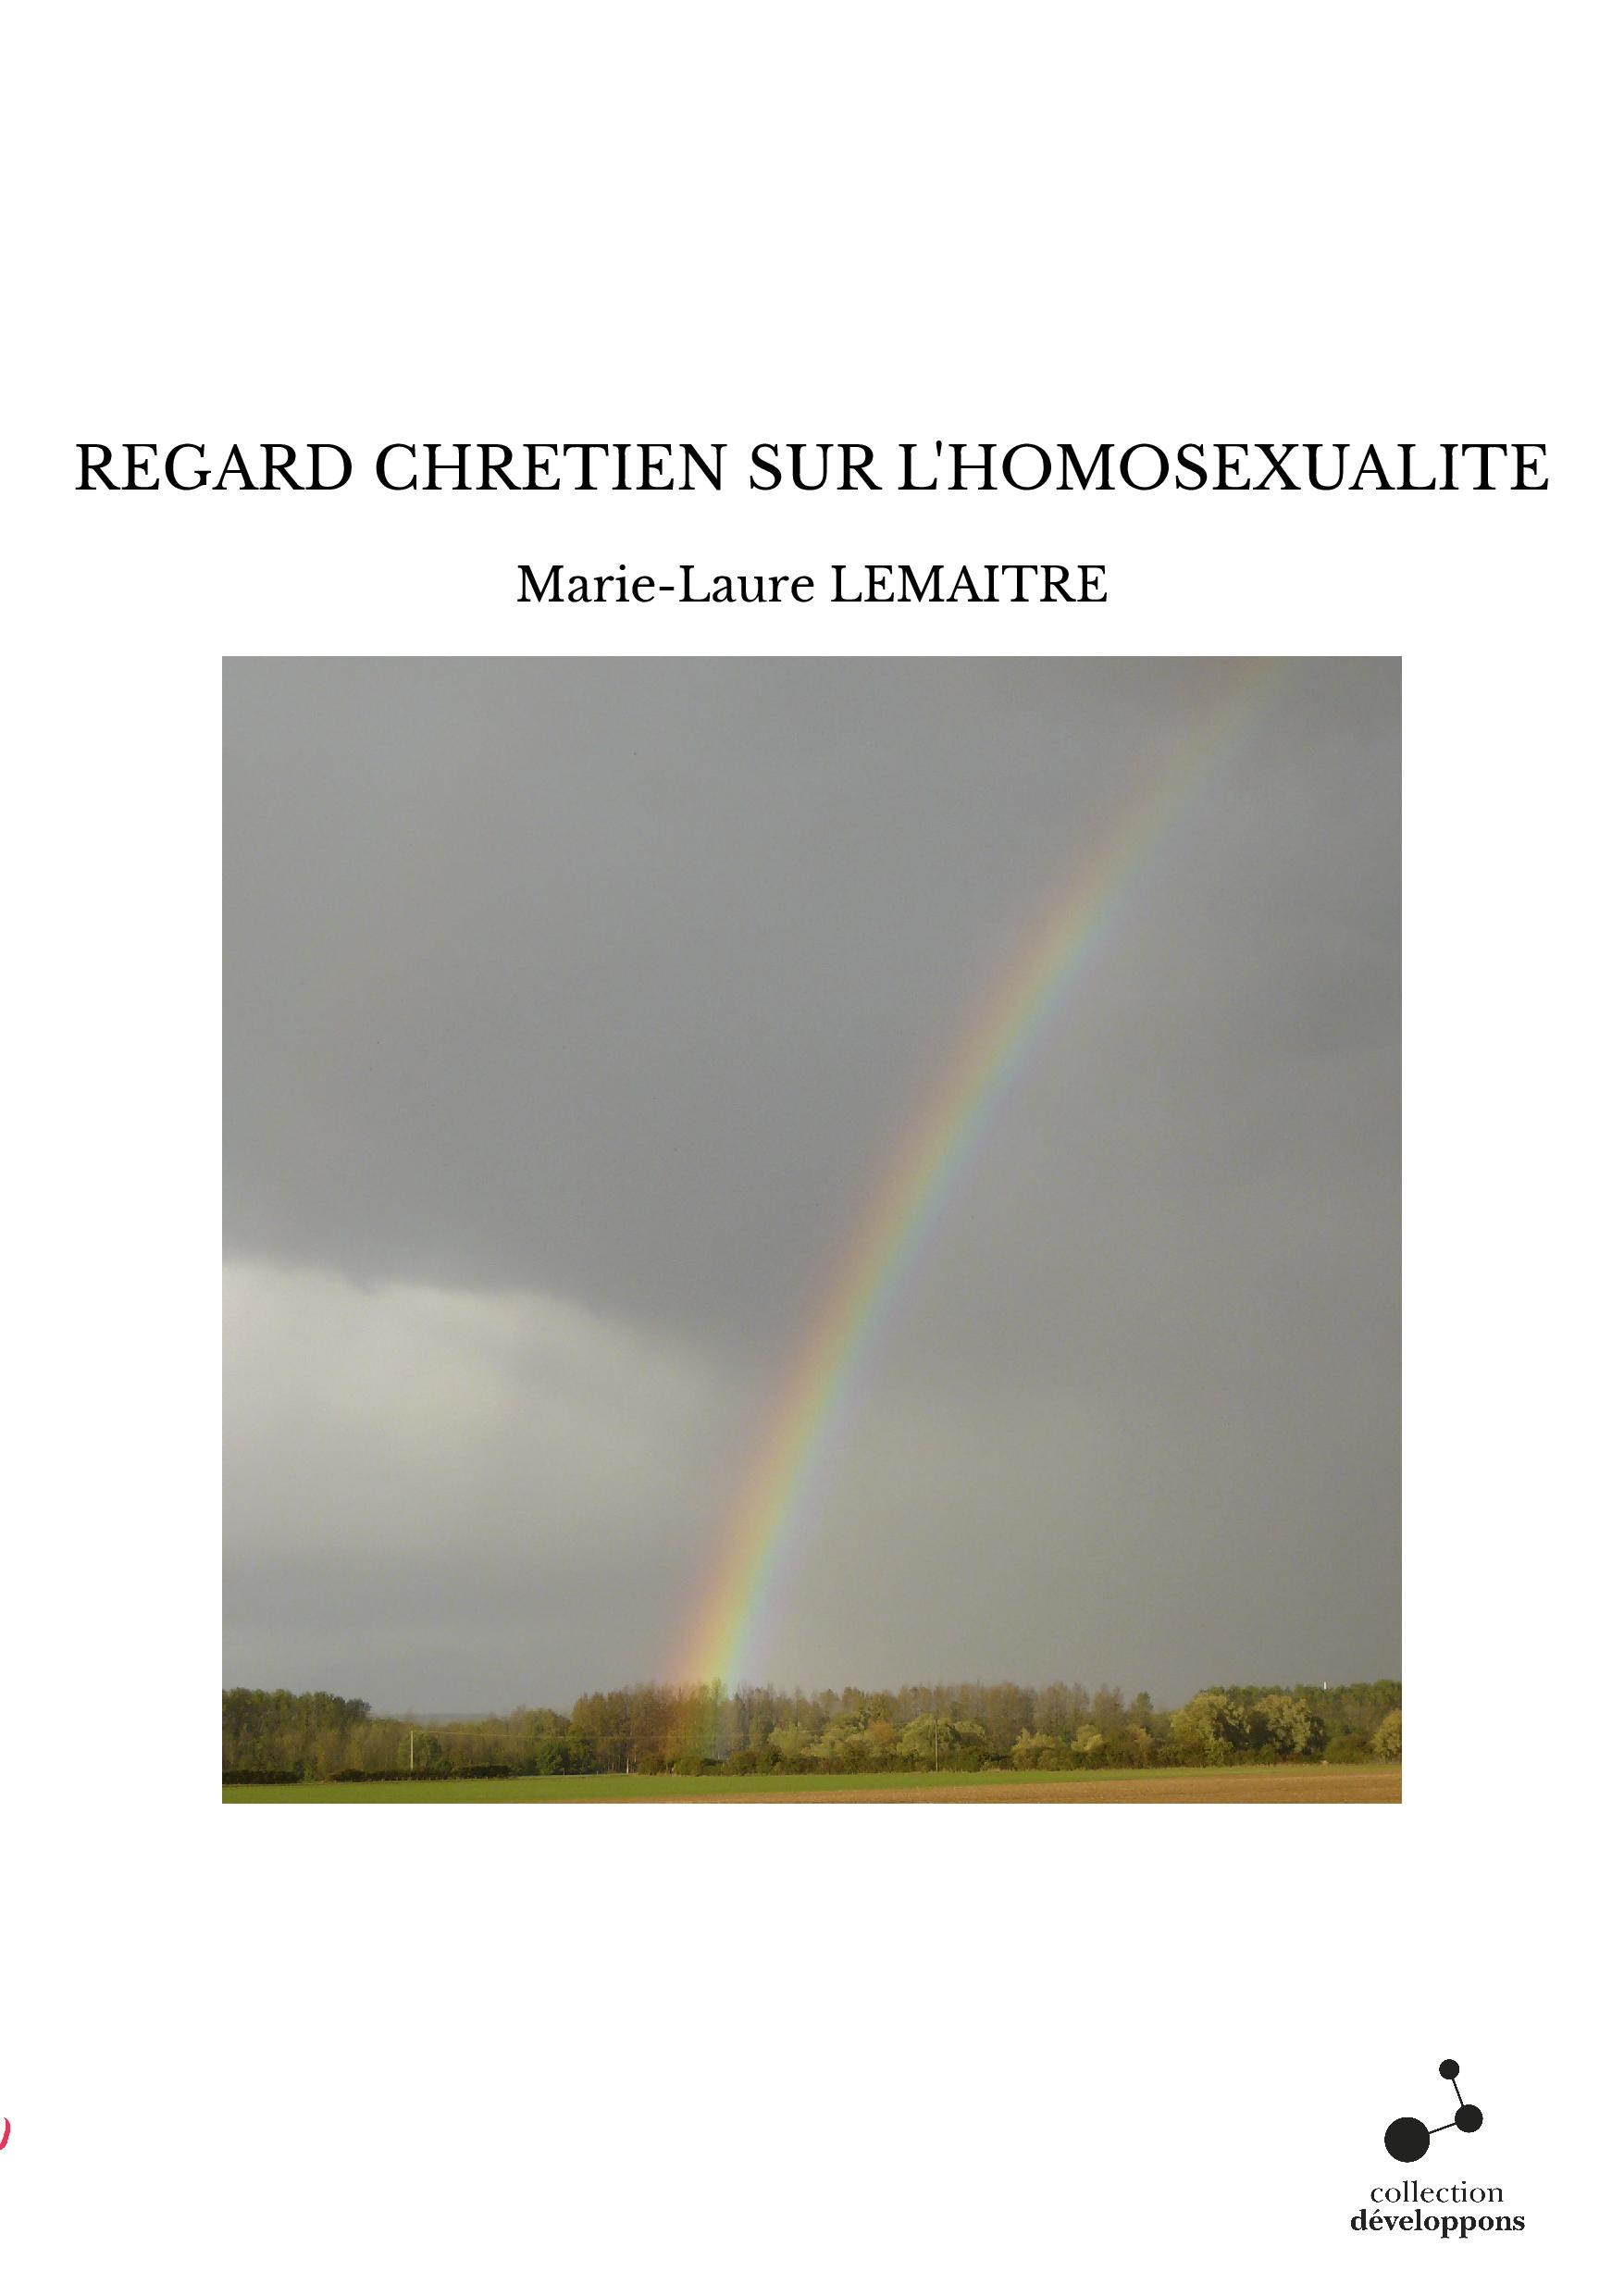 REGARD CHRETIEN SUR L'HOMOSEXUALITE